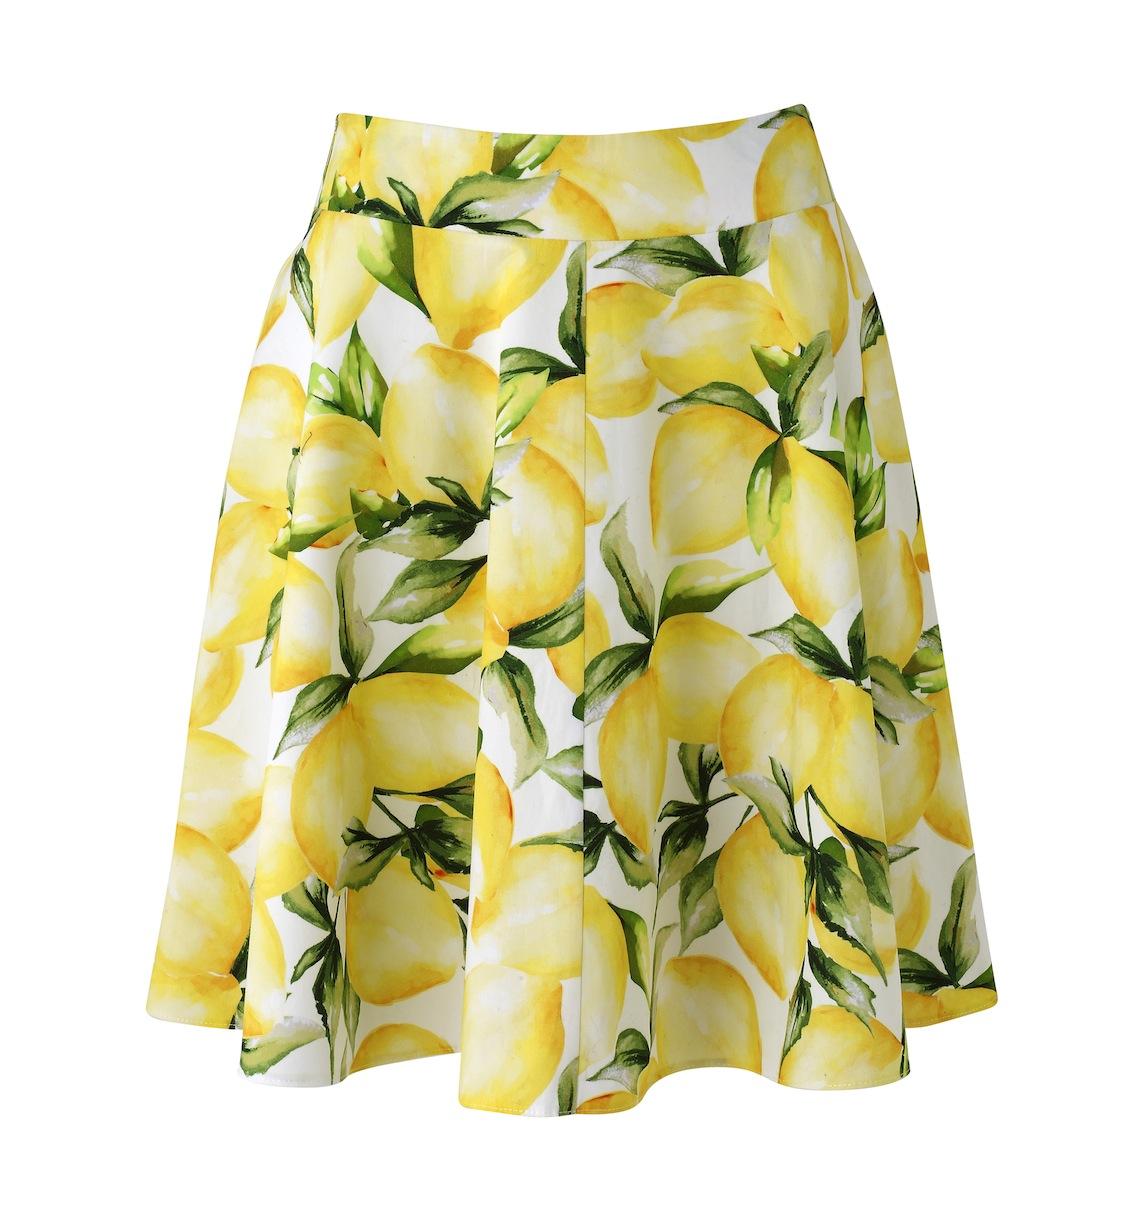 http://3.bp.blogspot.com/_n_ojzrofdsk/TUiAr5qugzI/AAAAAAAAAOA/X06a3flztXA/s1600/New+Look+Yellow+Lemon+Print+Skirt+%25E2%2582%25AC29.99.jpg